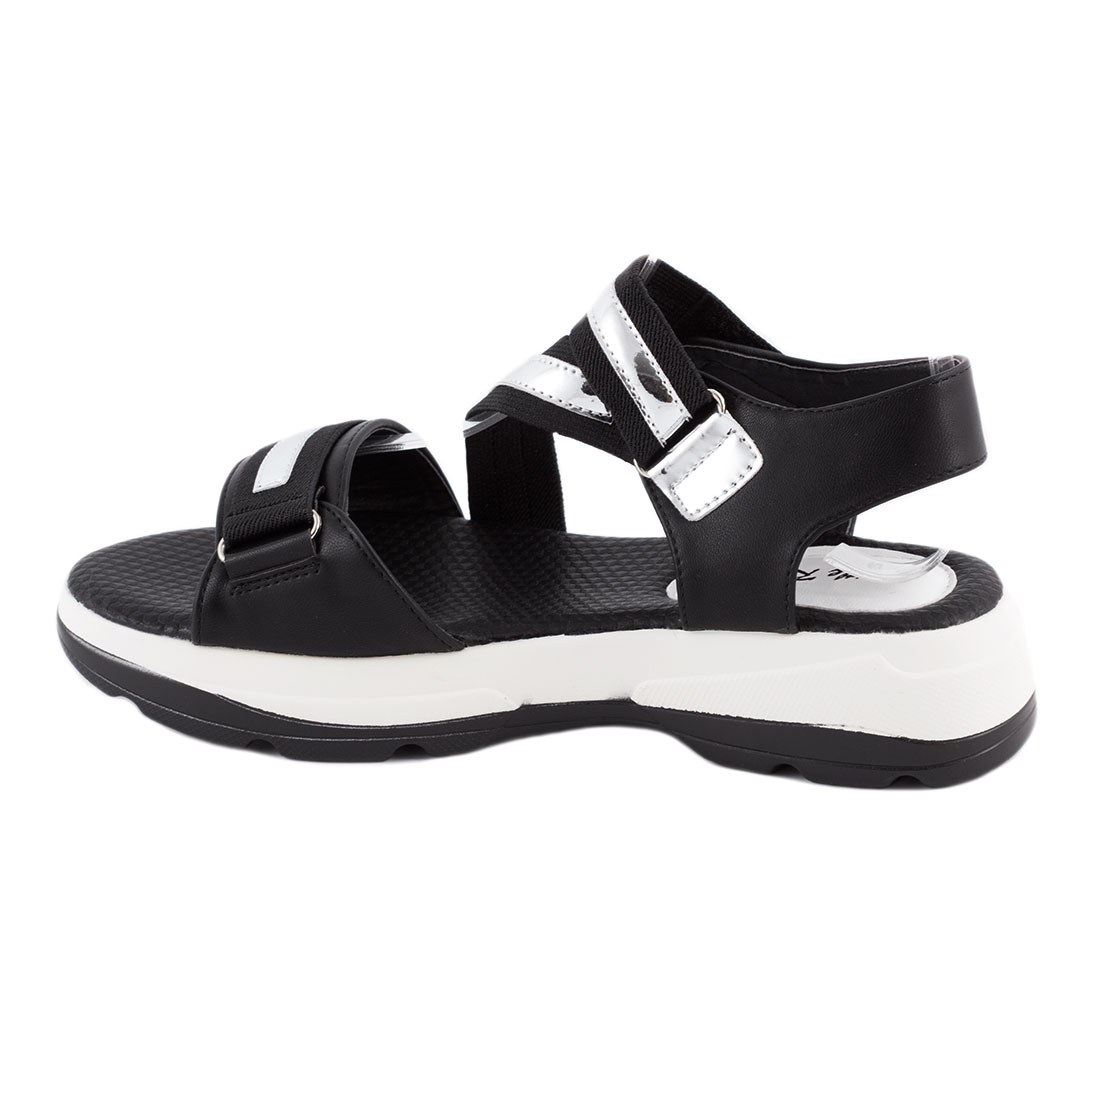 Sandale de dama comode GH380-SILVER